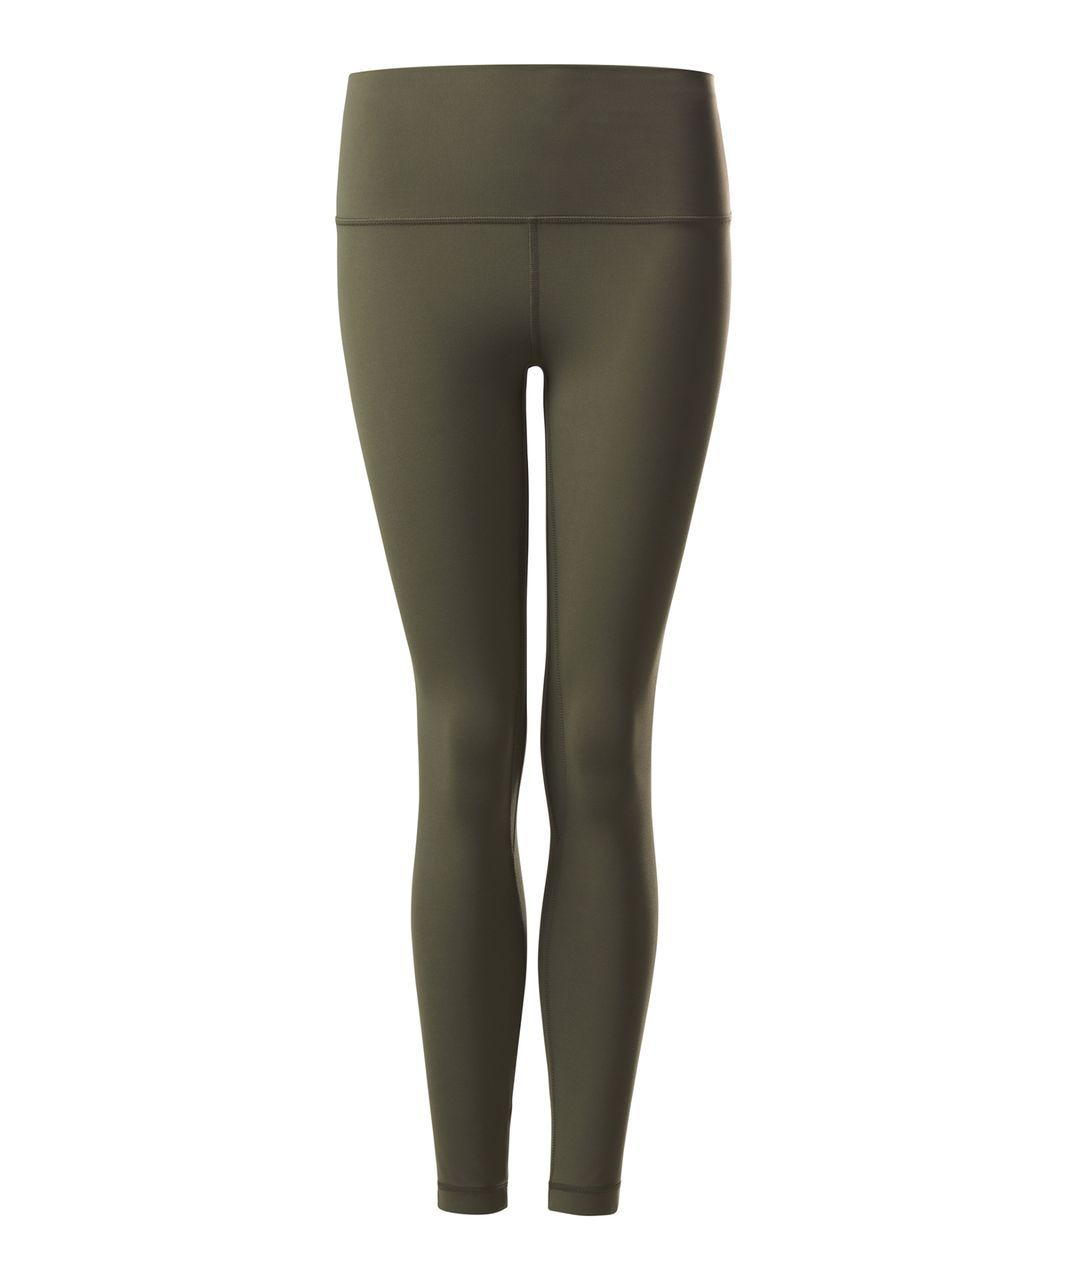 8d2c4403ef72c5 Lululemon Align Pant II - Fatigue Green | Lululemon Align pants and ...